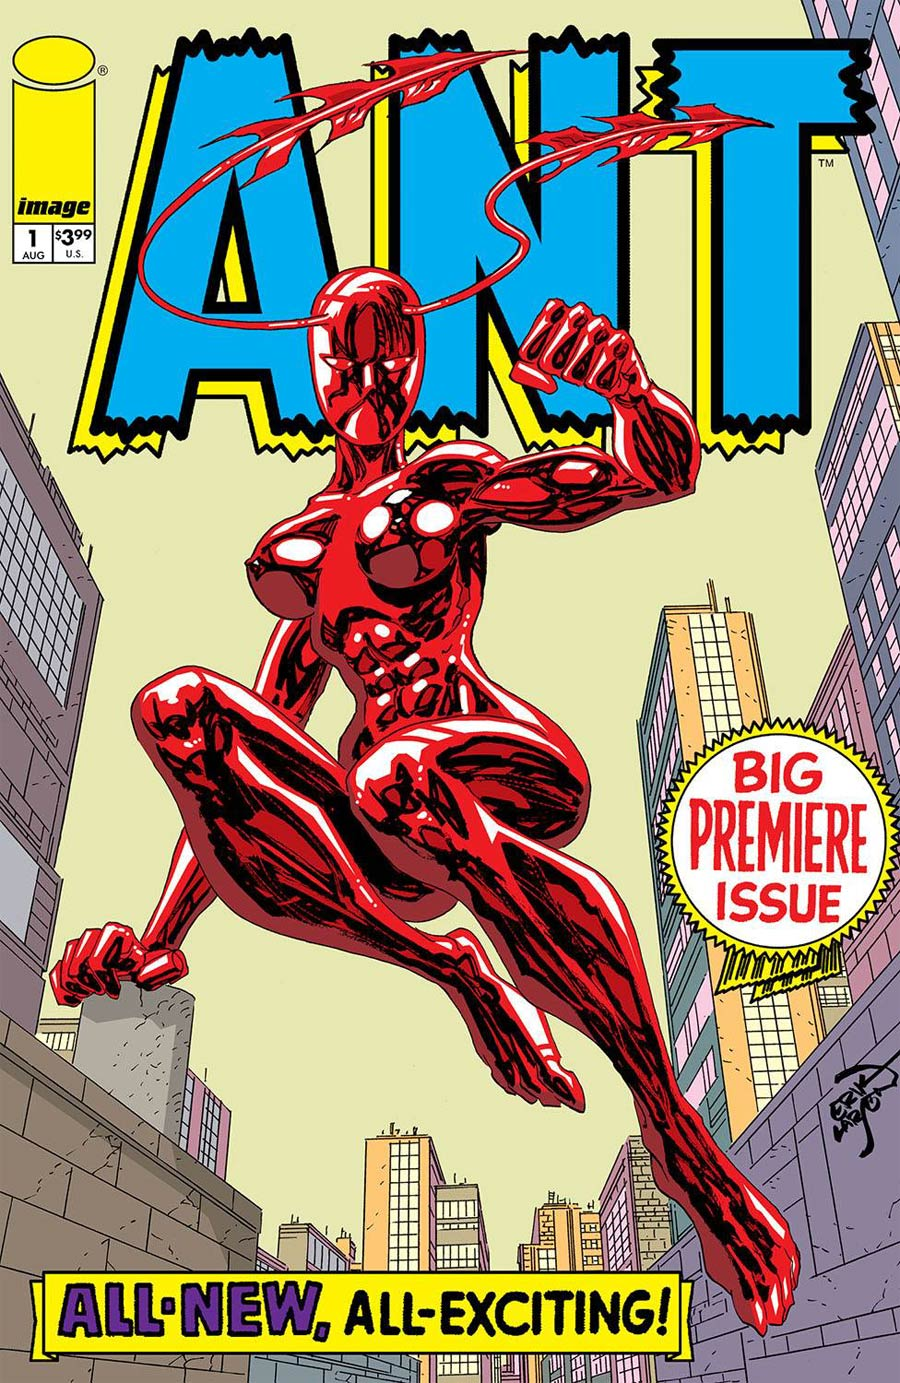 Ant Vol 3 #1 Cover A Regular Erik Larsen Cover